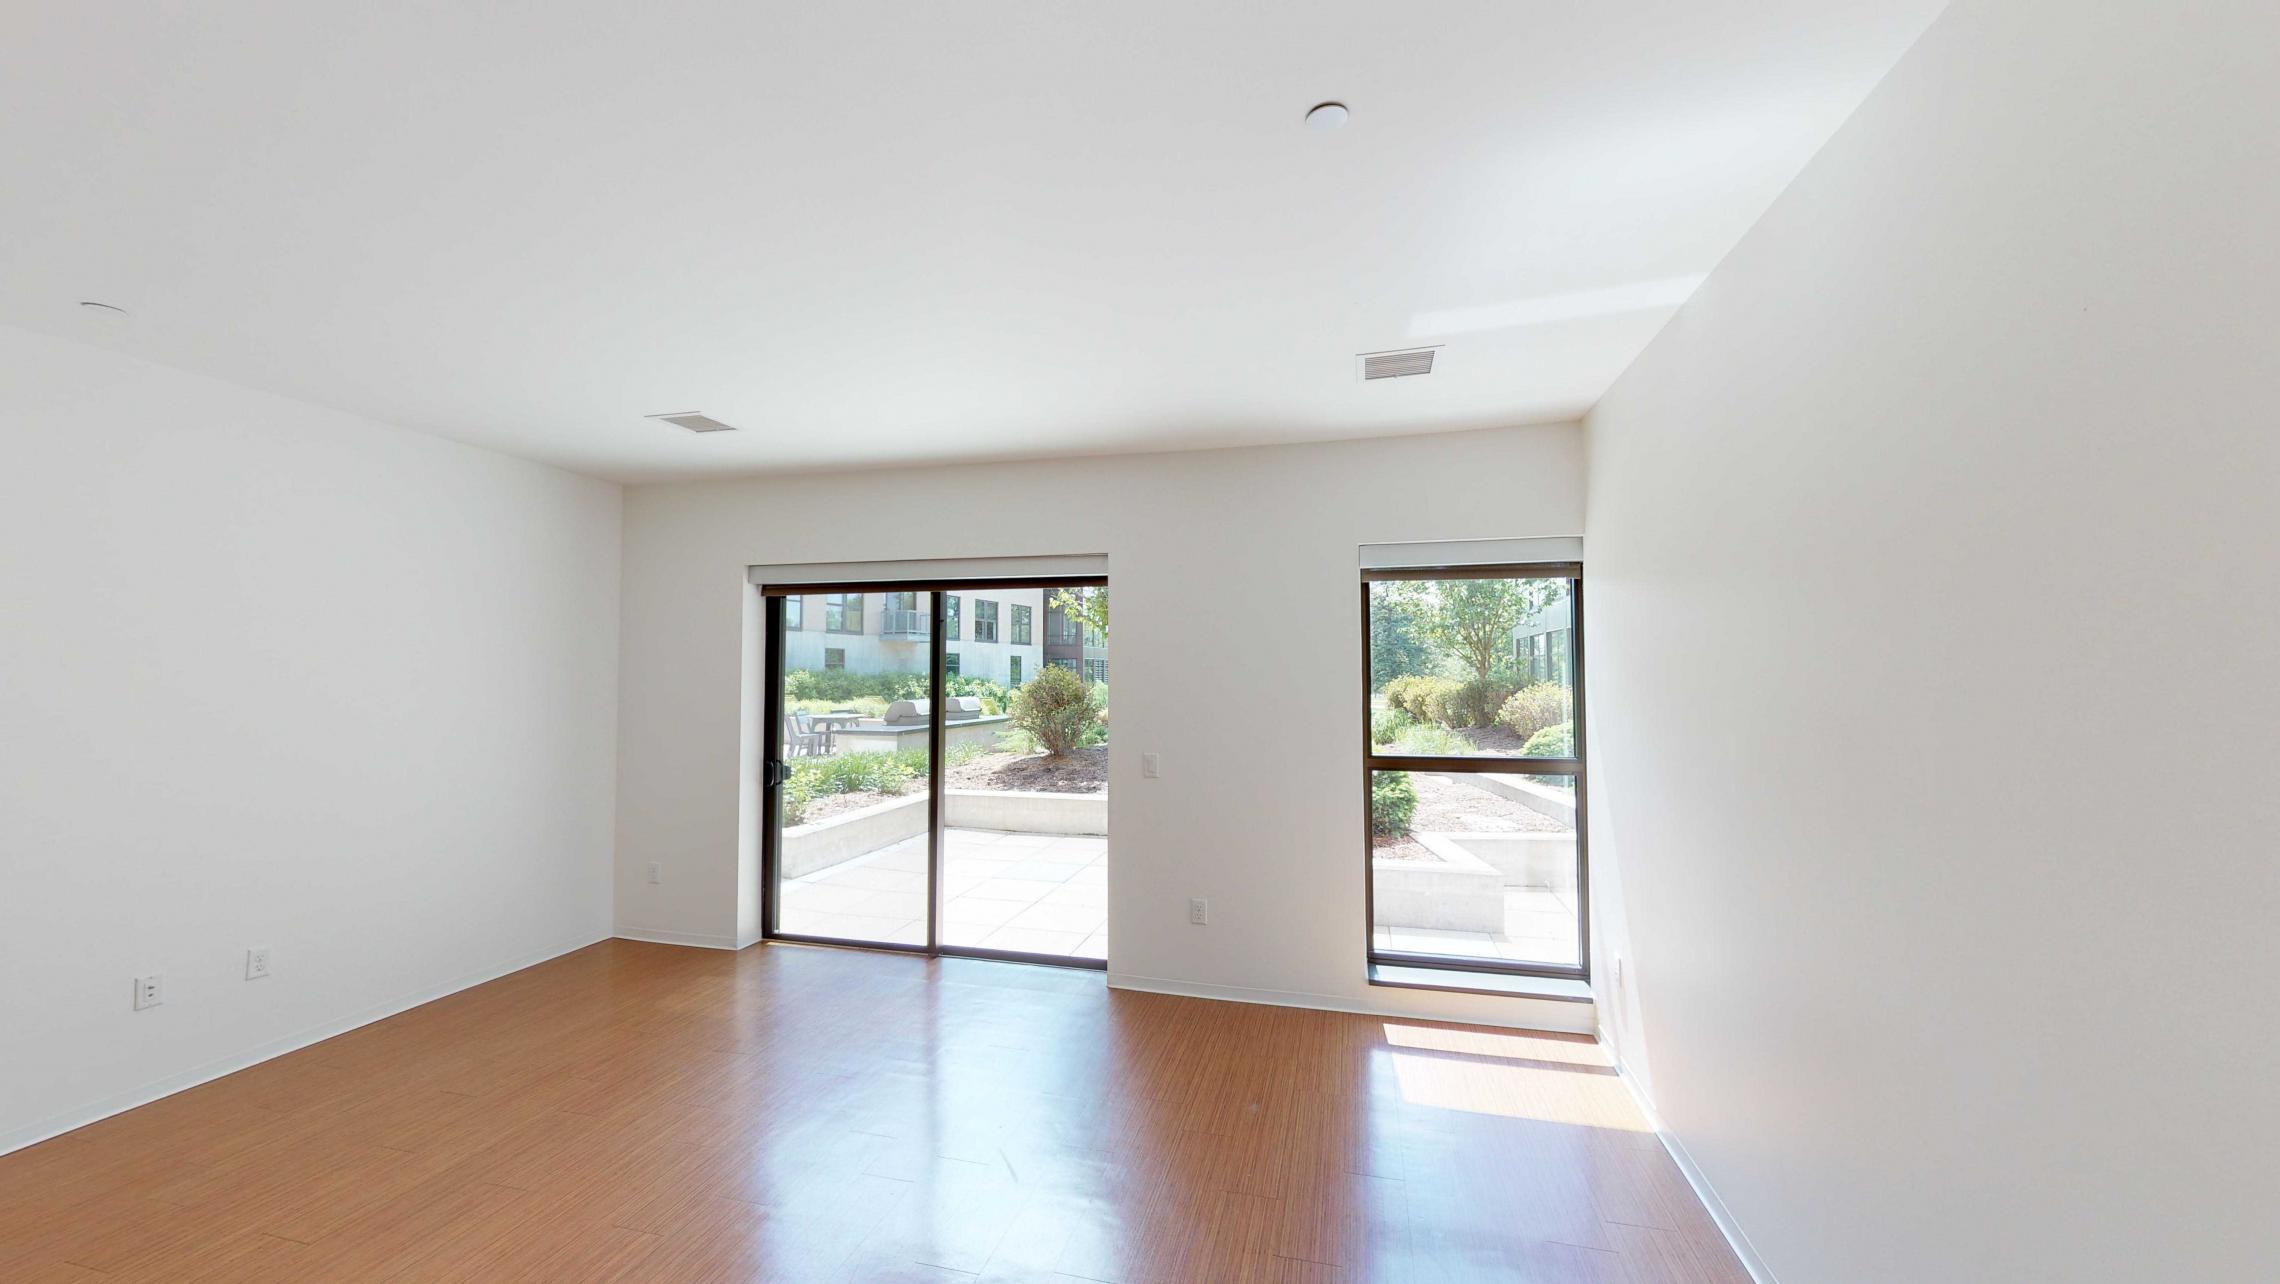 SEVEN27-Apartment-115-studio-lake view-modern-upscale-downtown-madison-patio-courtyard-living space.jpg